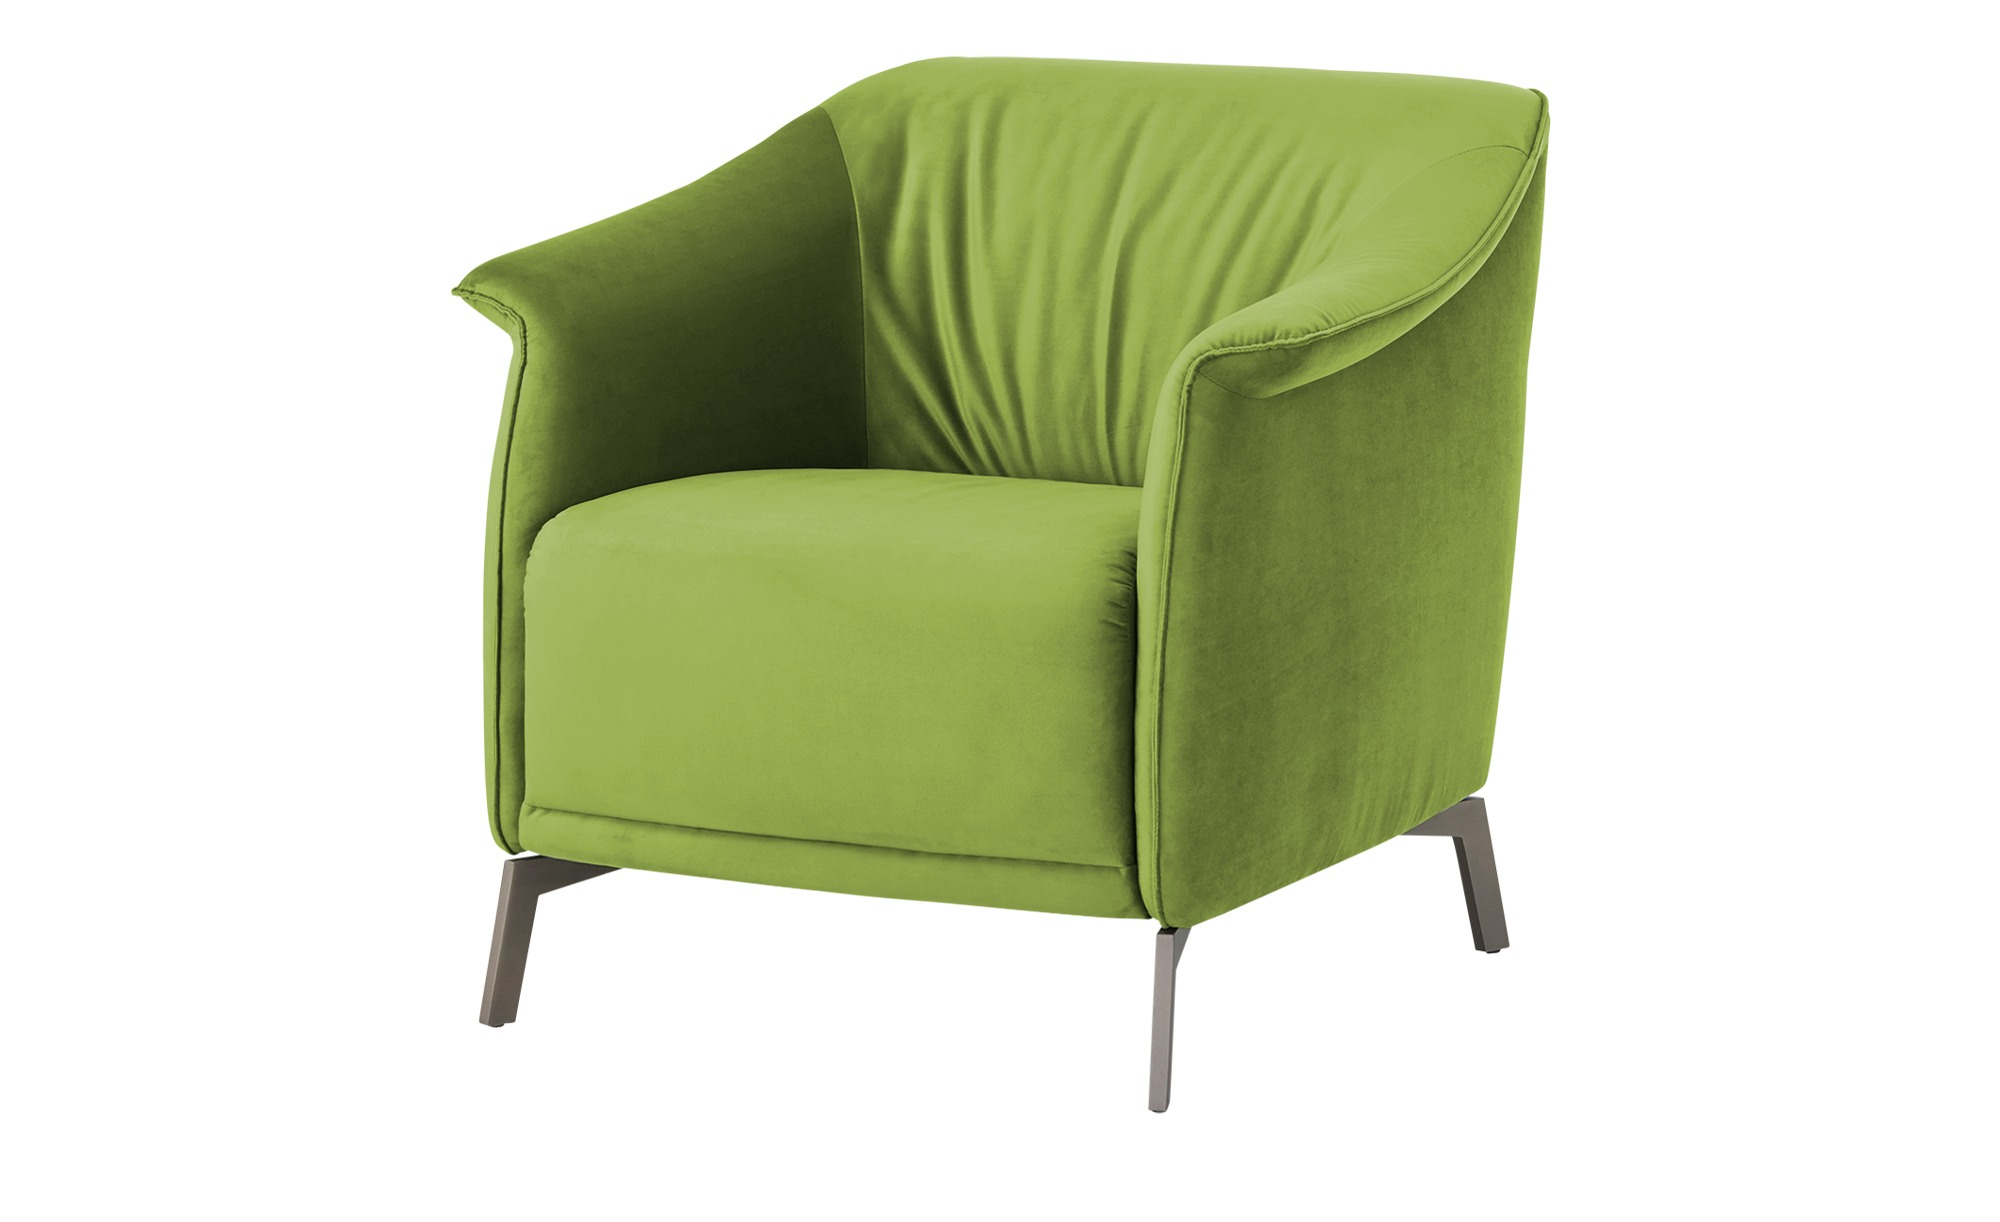 Sessel  Lamia ¦ grün ¦ Maße (cm): B: 80 H: 77 T: 83 Polstermöbel > Sessel > Polstersessel - Höffner